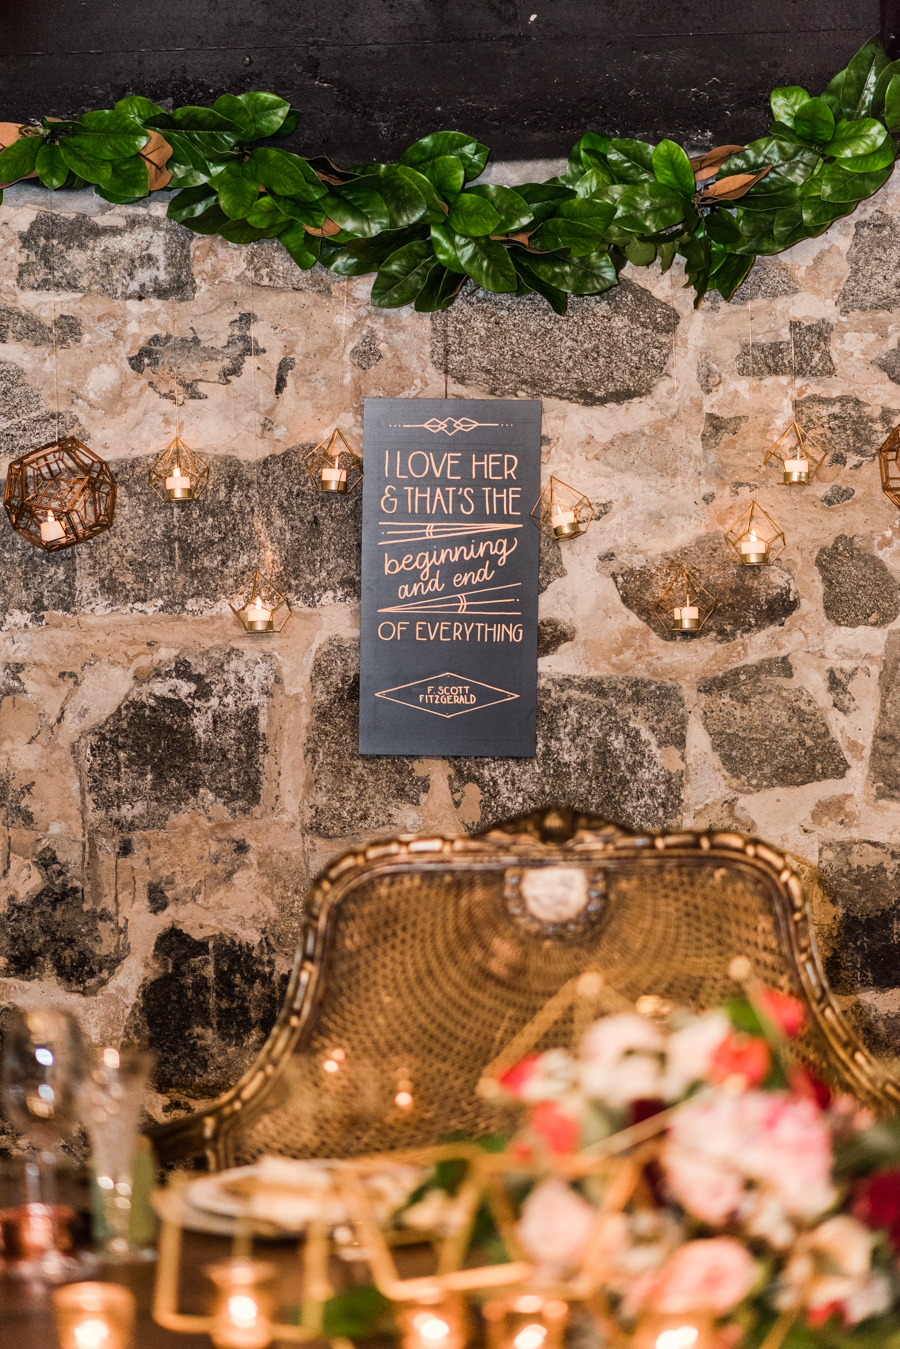 britney-clause-photography-big-fake-wedding-submission-0028-photo.jpg